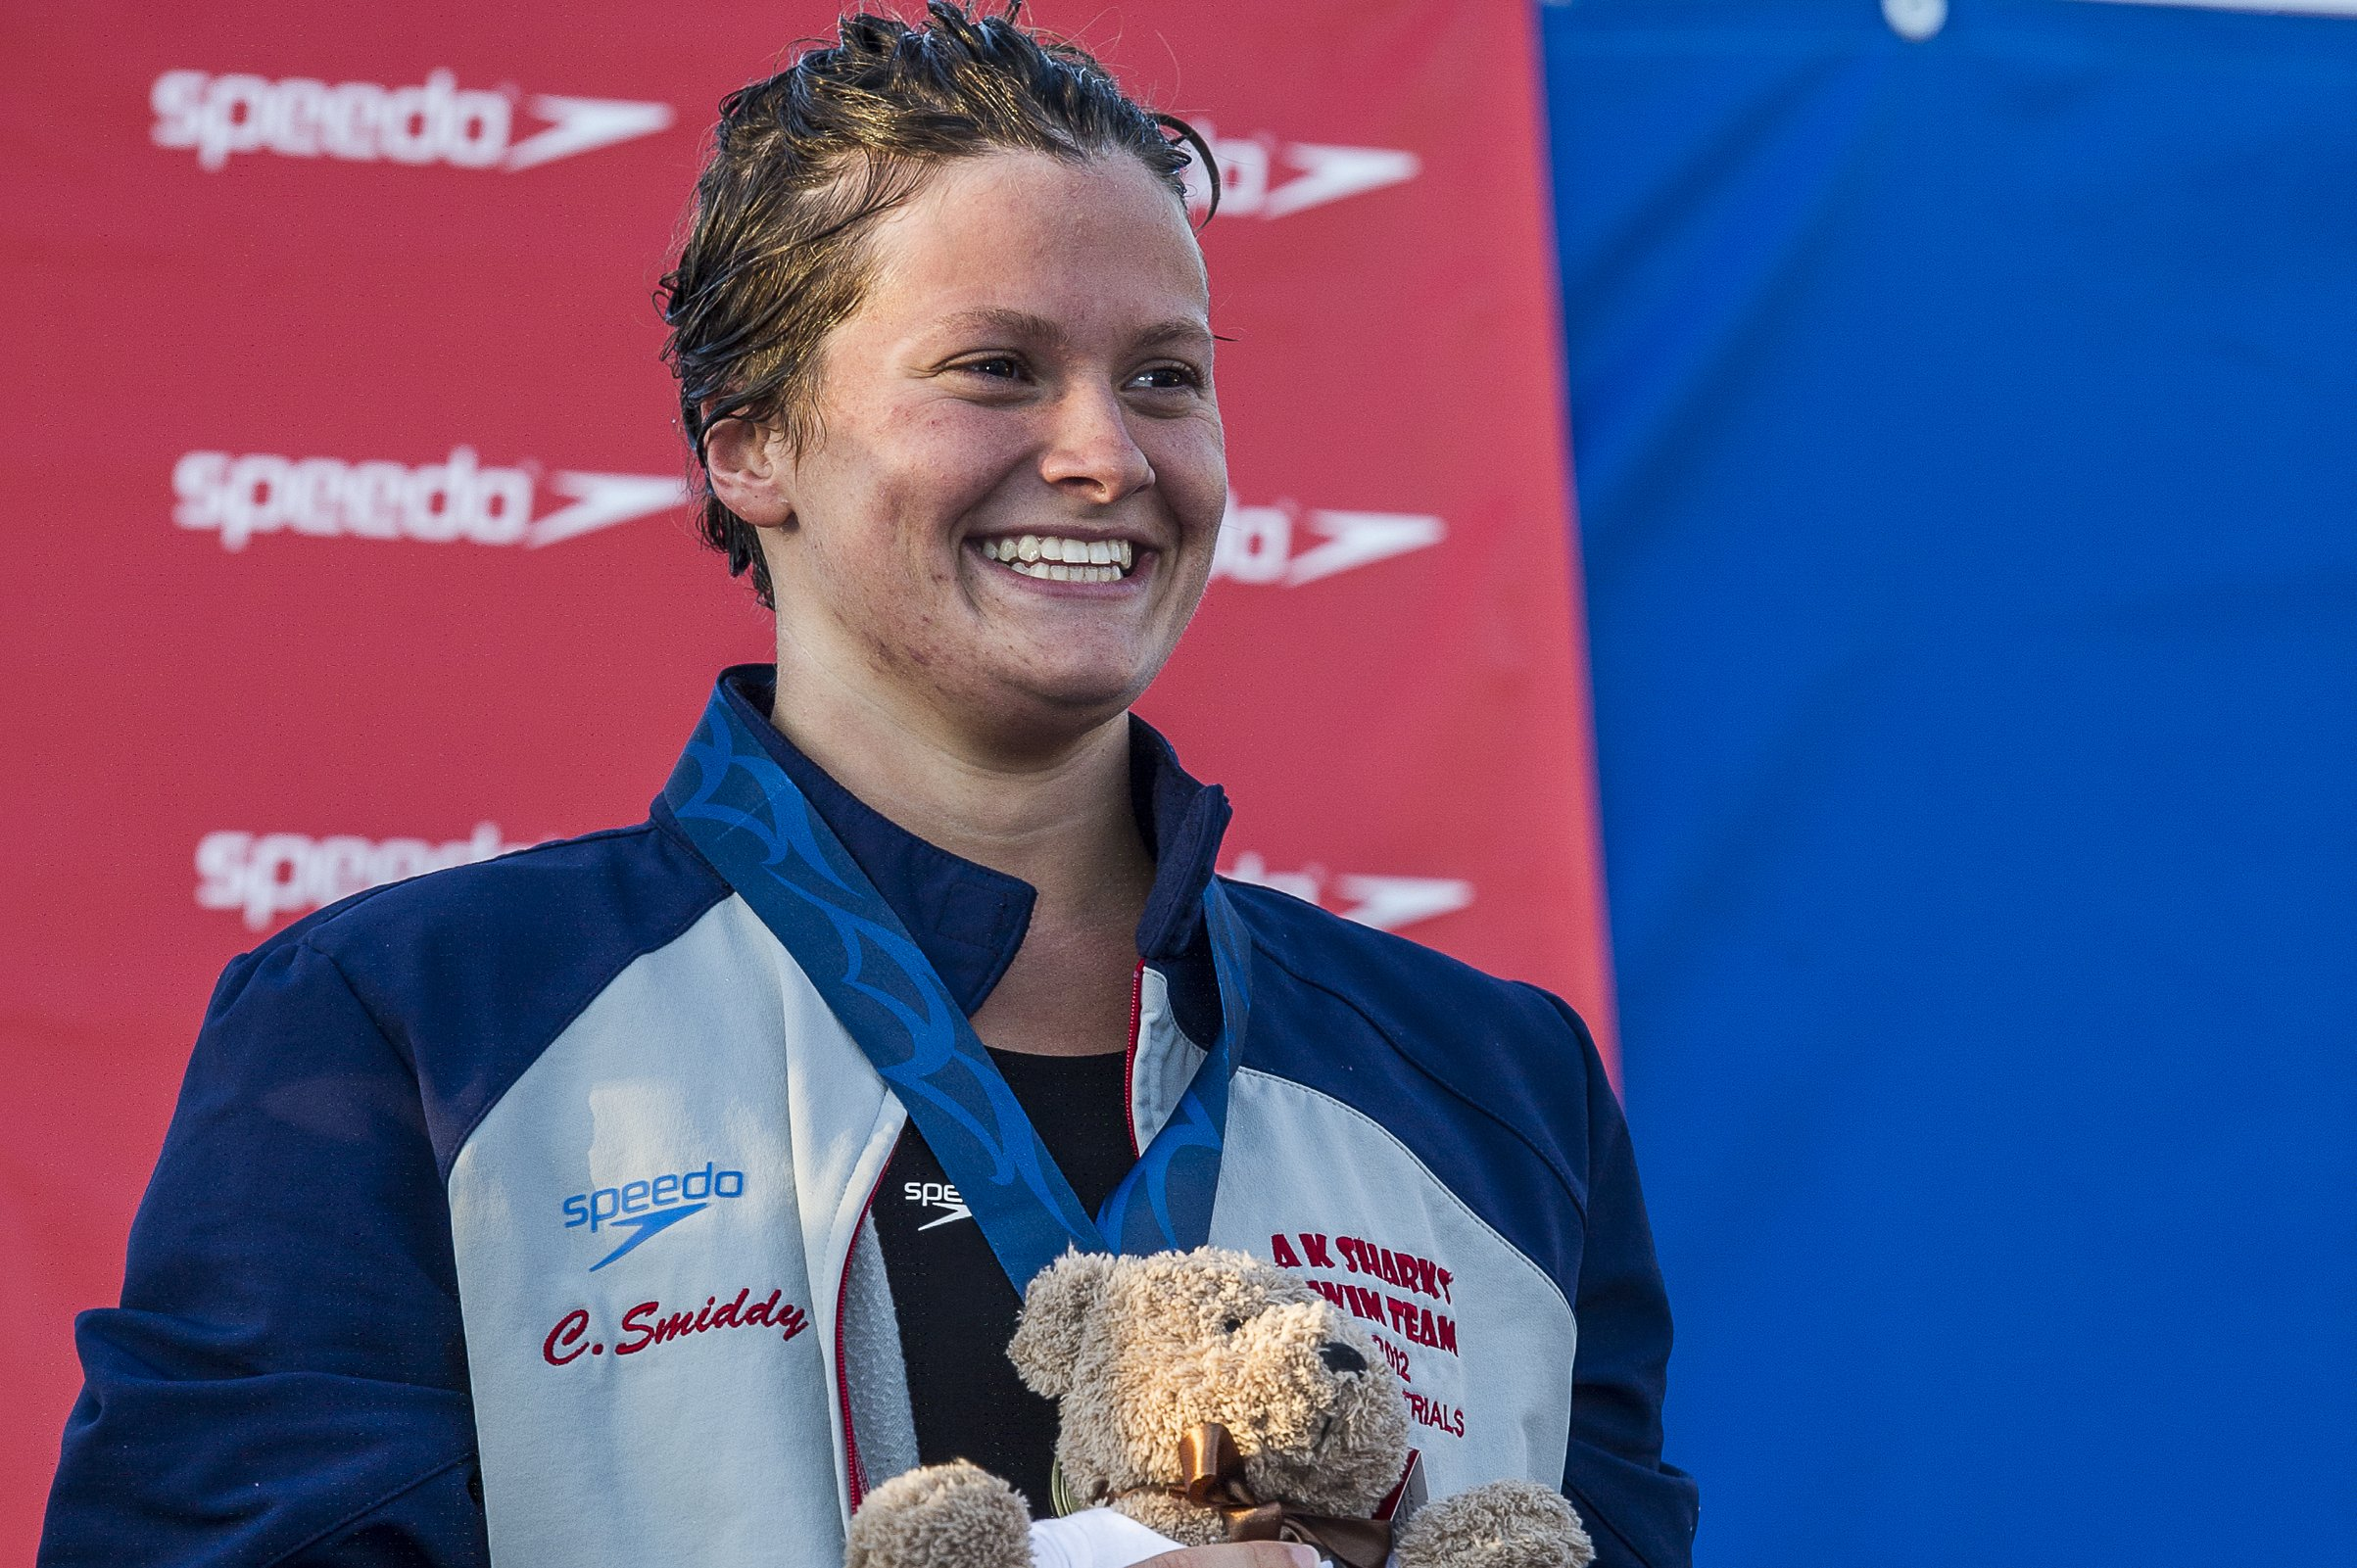 Clara Smiddy wins the 100 backstroke.